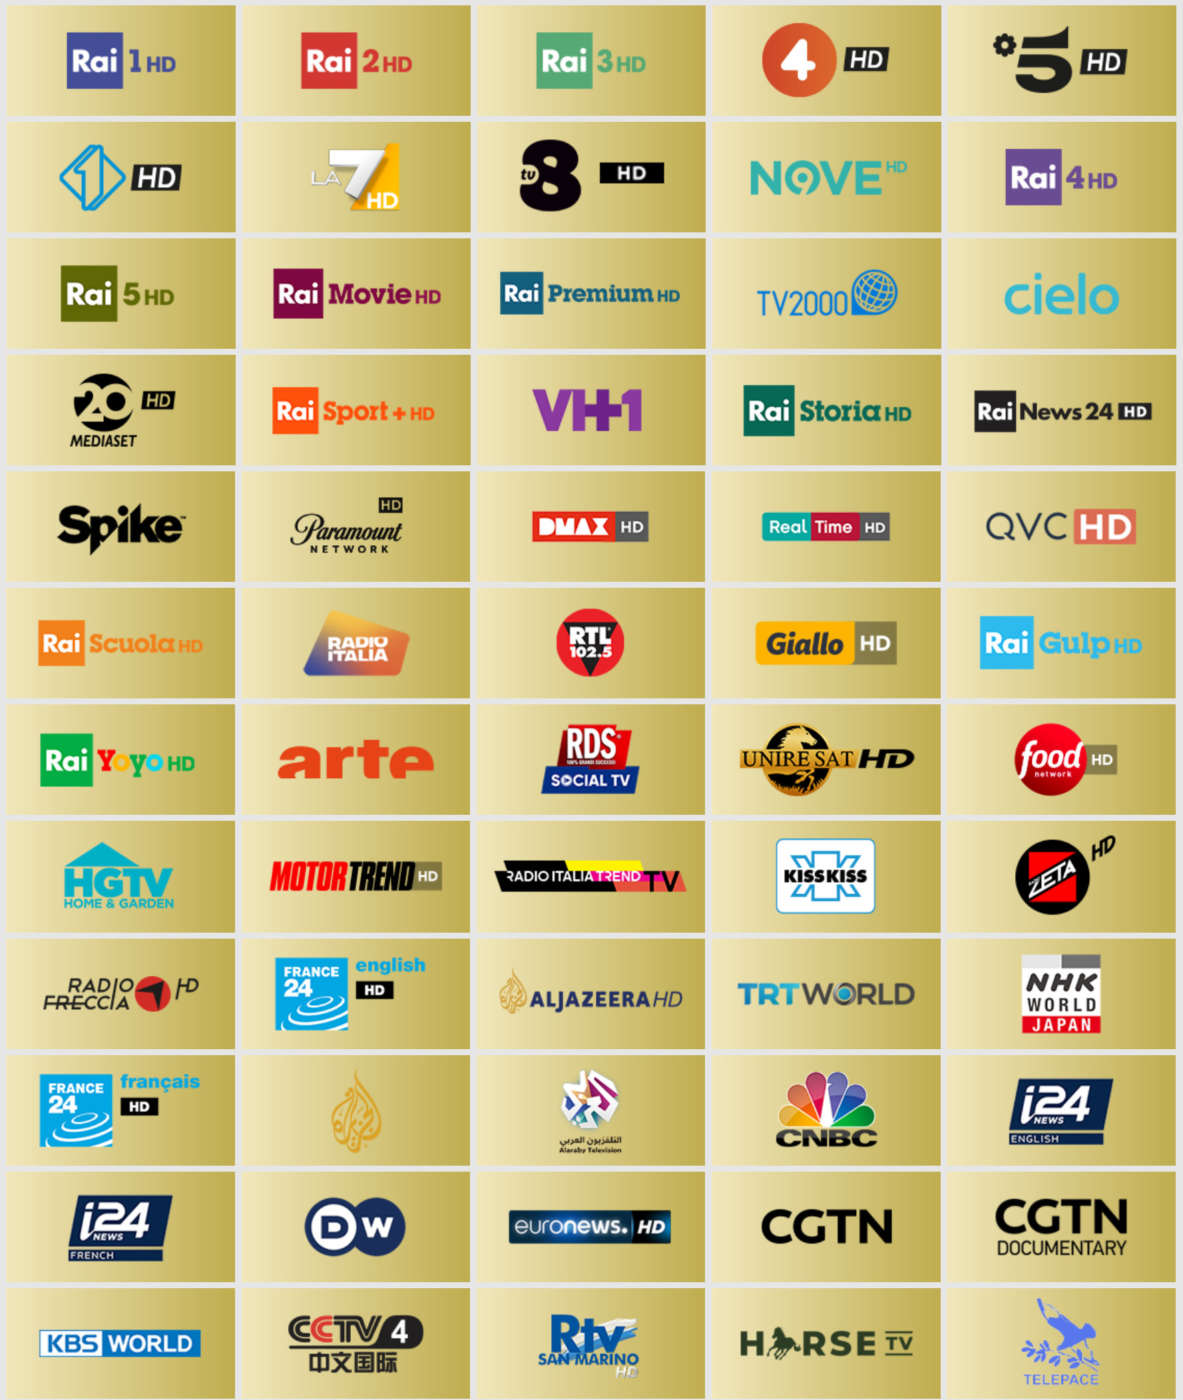 tivùsat - canali HD